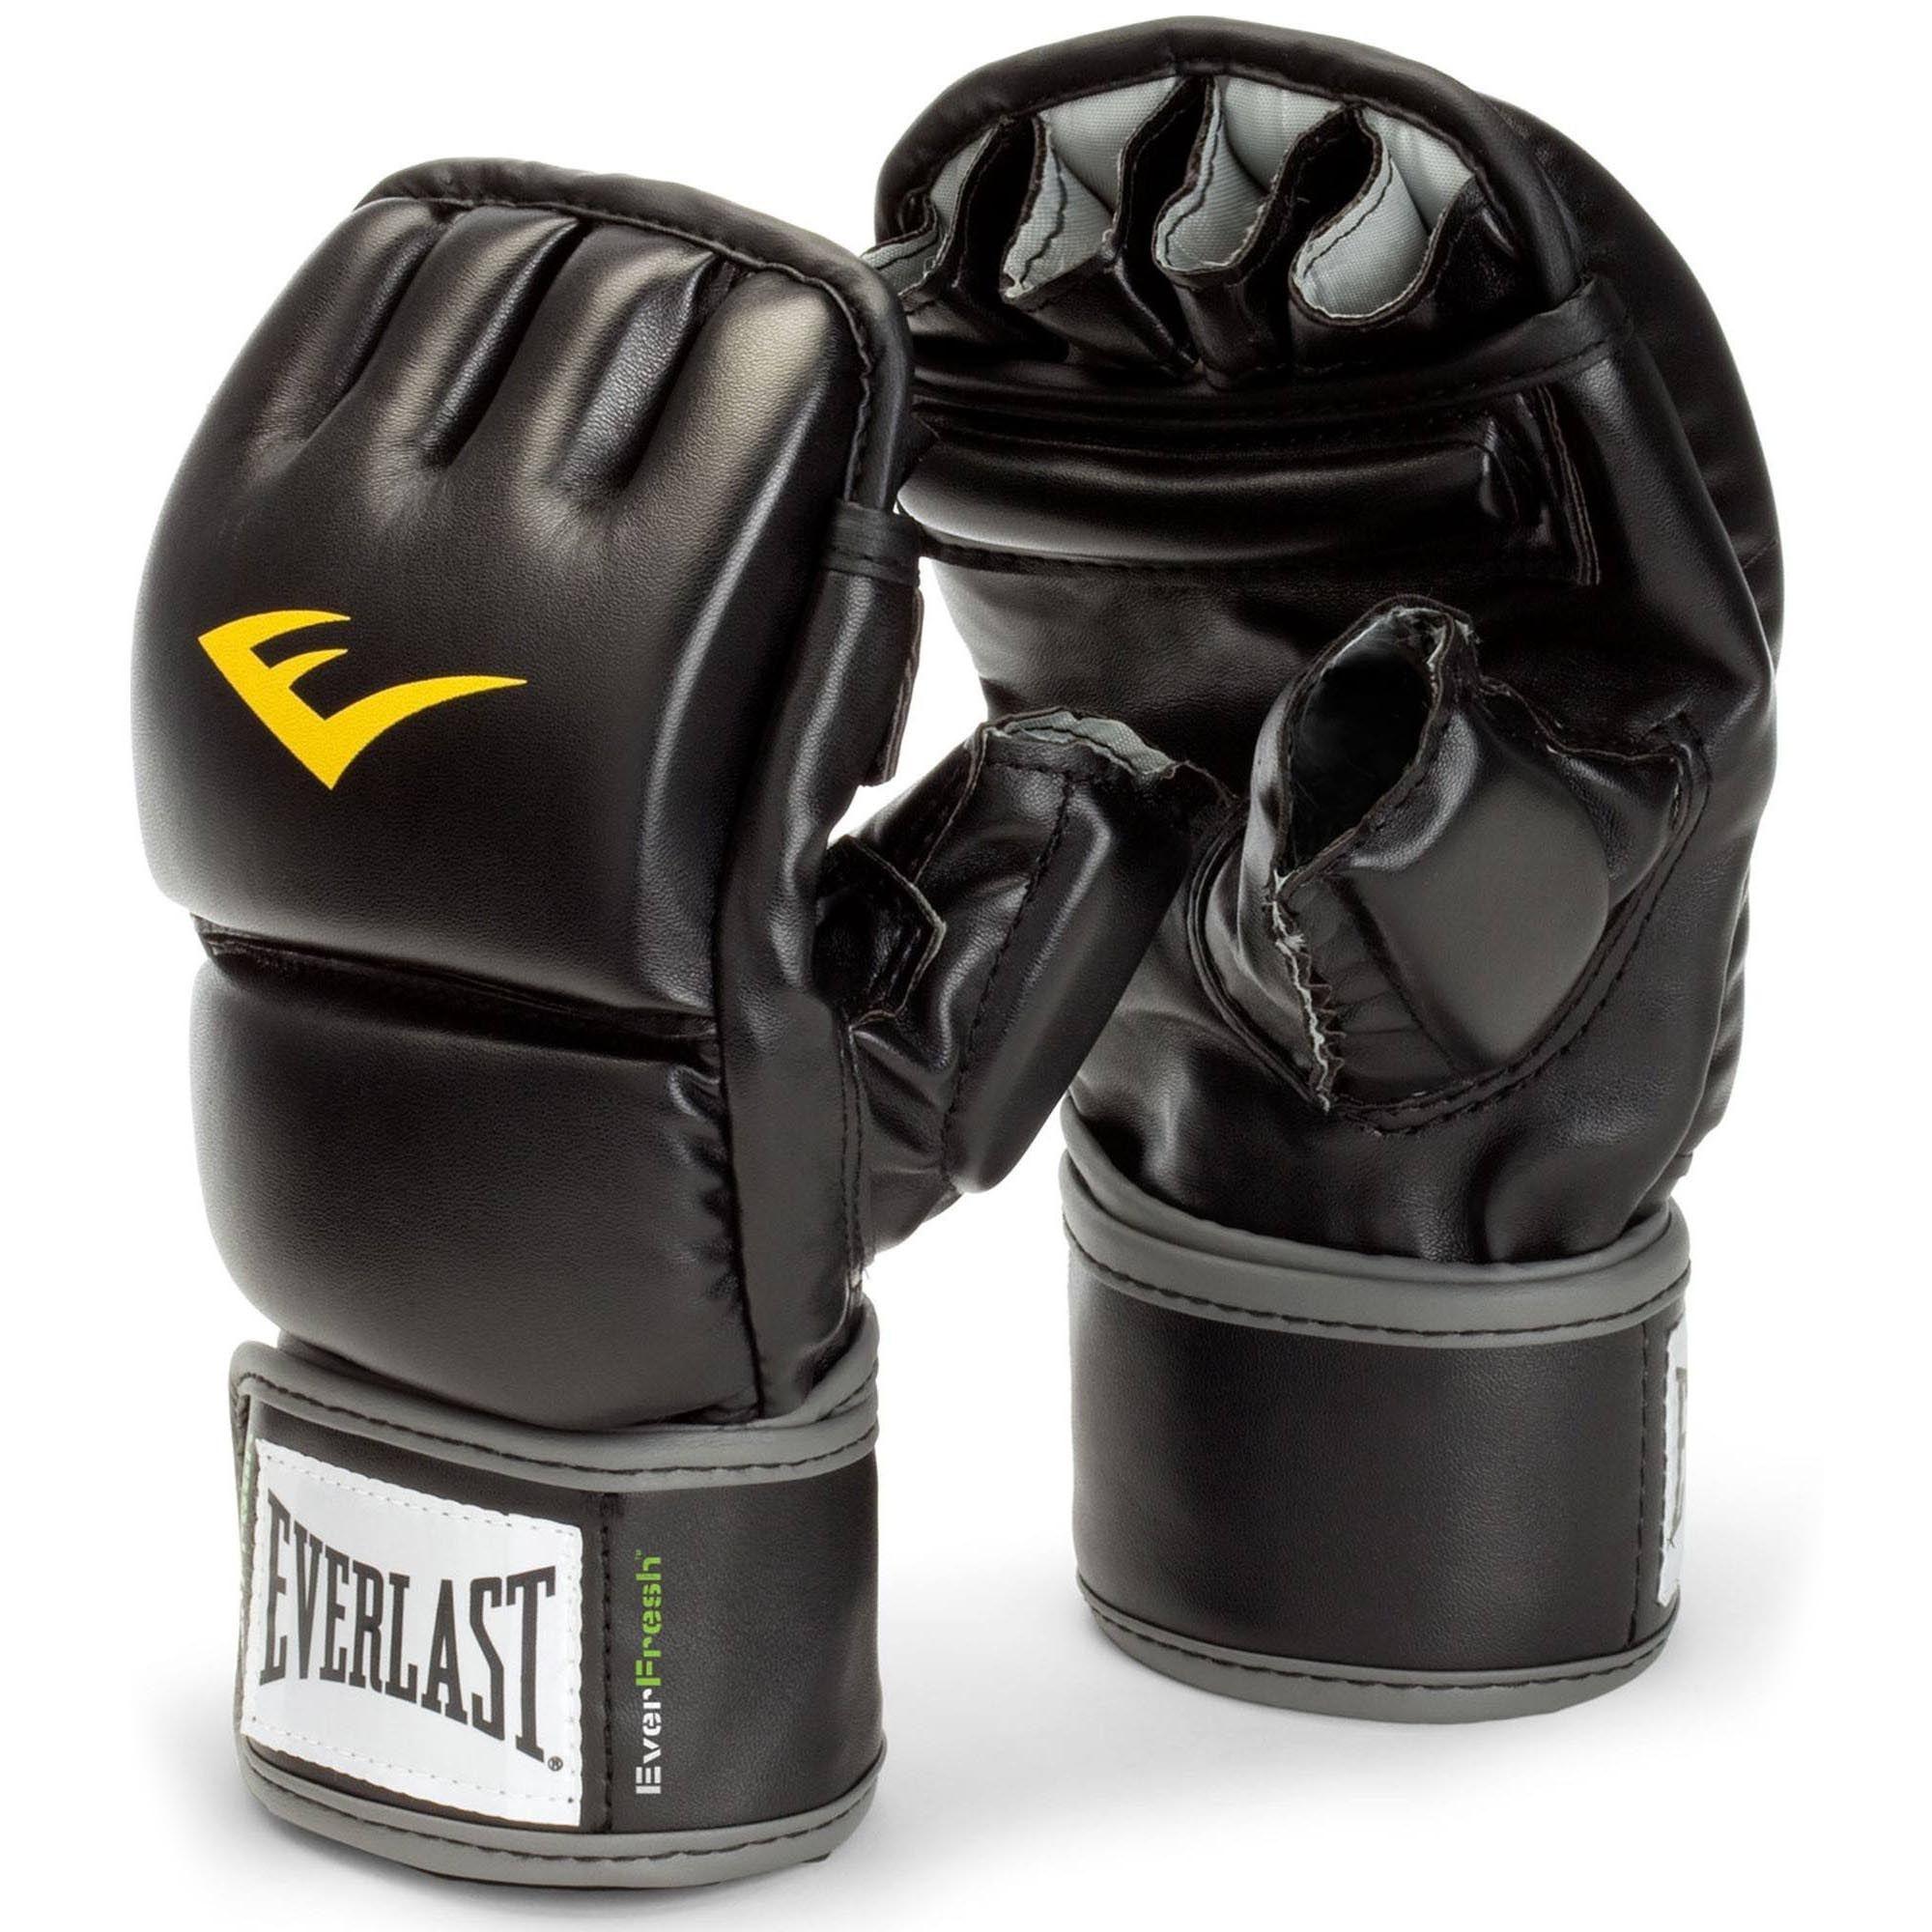 Everlast Wrist Wrap Heavy Bag Gloves Sweatband Com